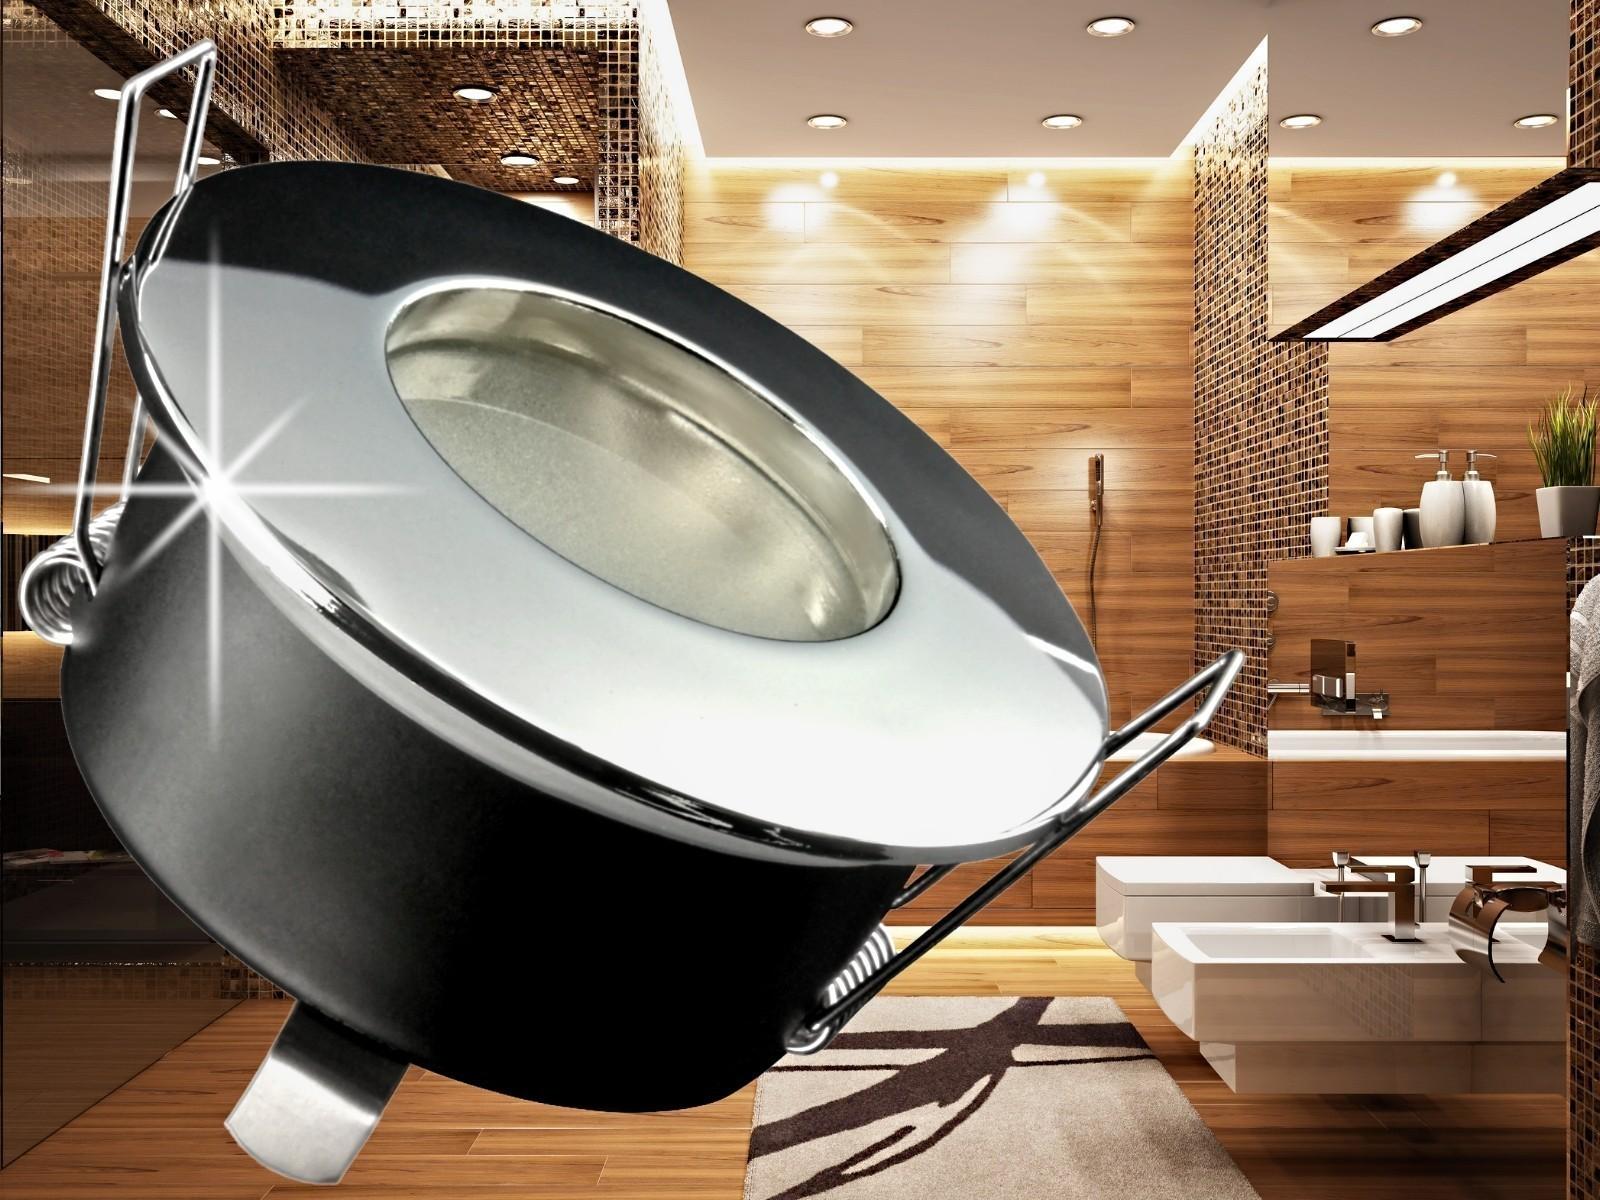 rw 1 feuchtraum led einbaustrahler bad einbauleuchte chrom ip65 5w smd leds warm wei gu10. Black Bedroom Furniture Sets. Home Design Ideas